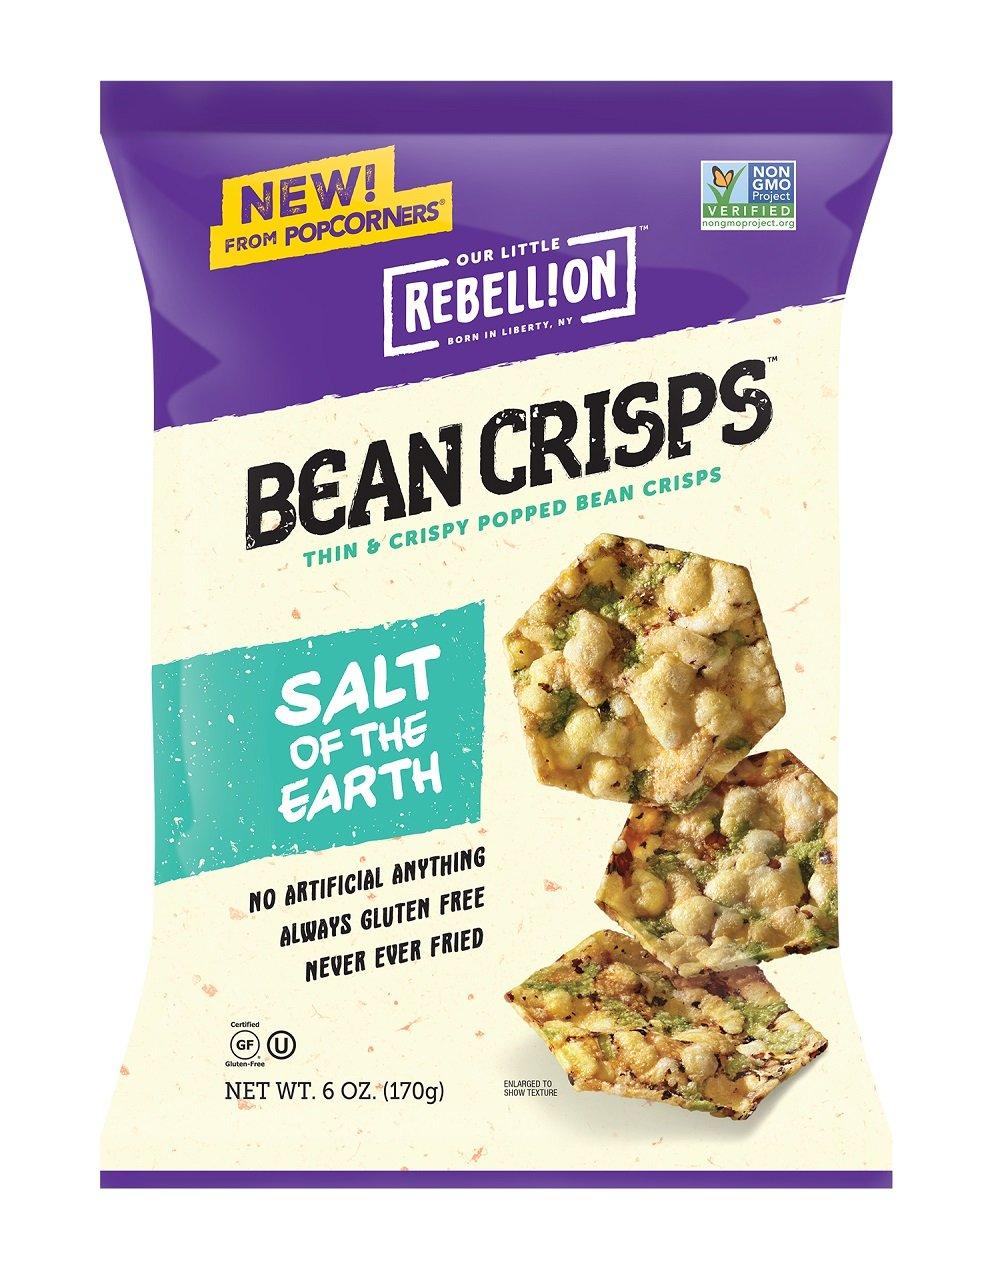 Subscription Box Swaps Popcorners Bean Crisps